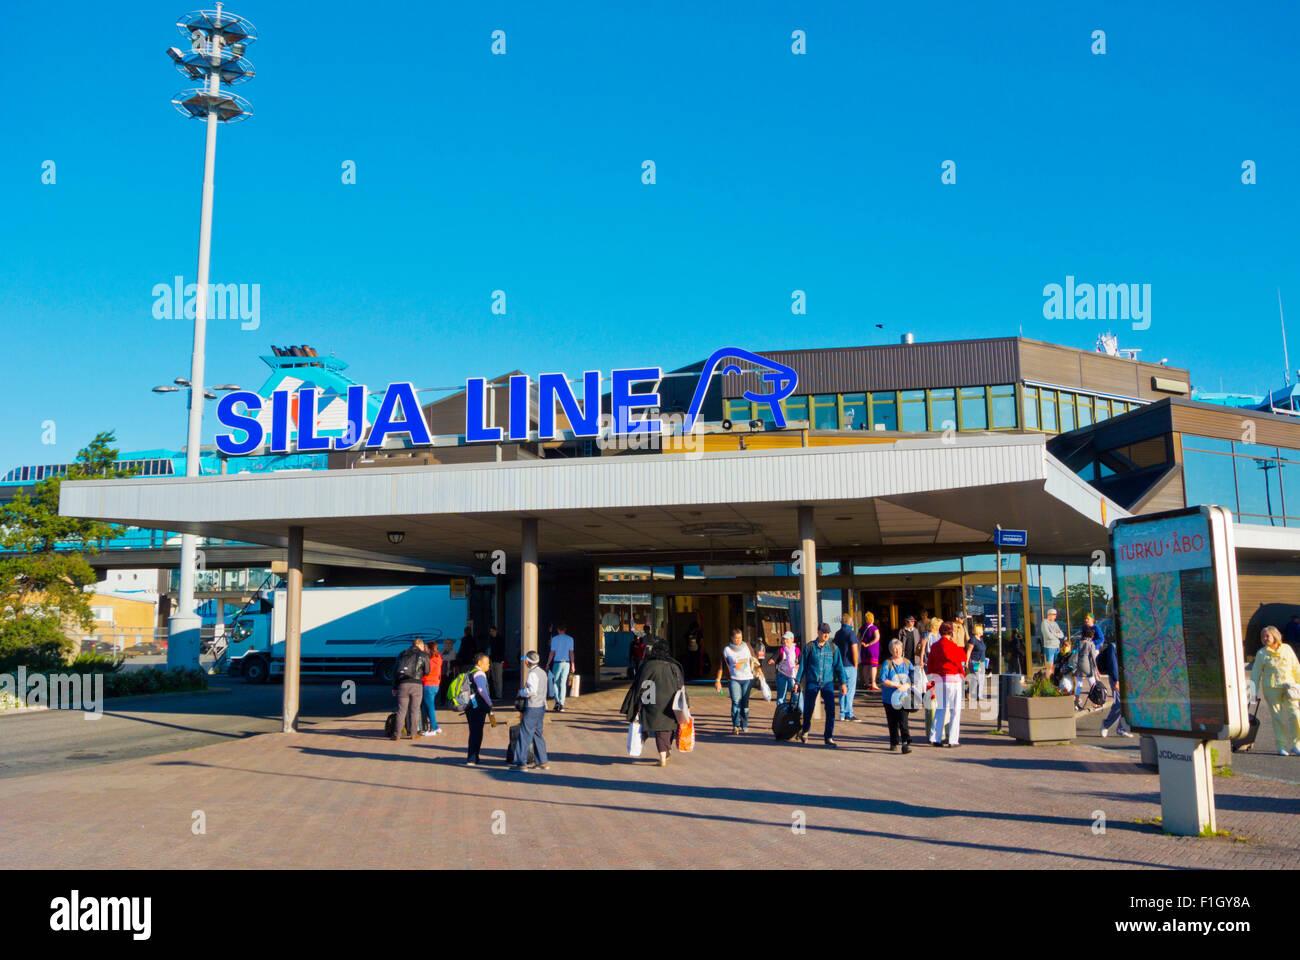 Silja Terminaali Helsinki